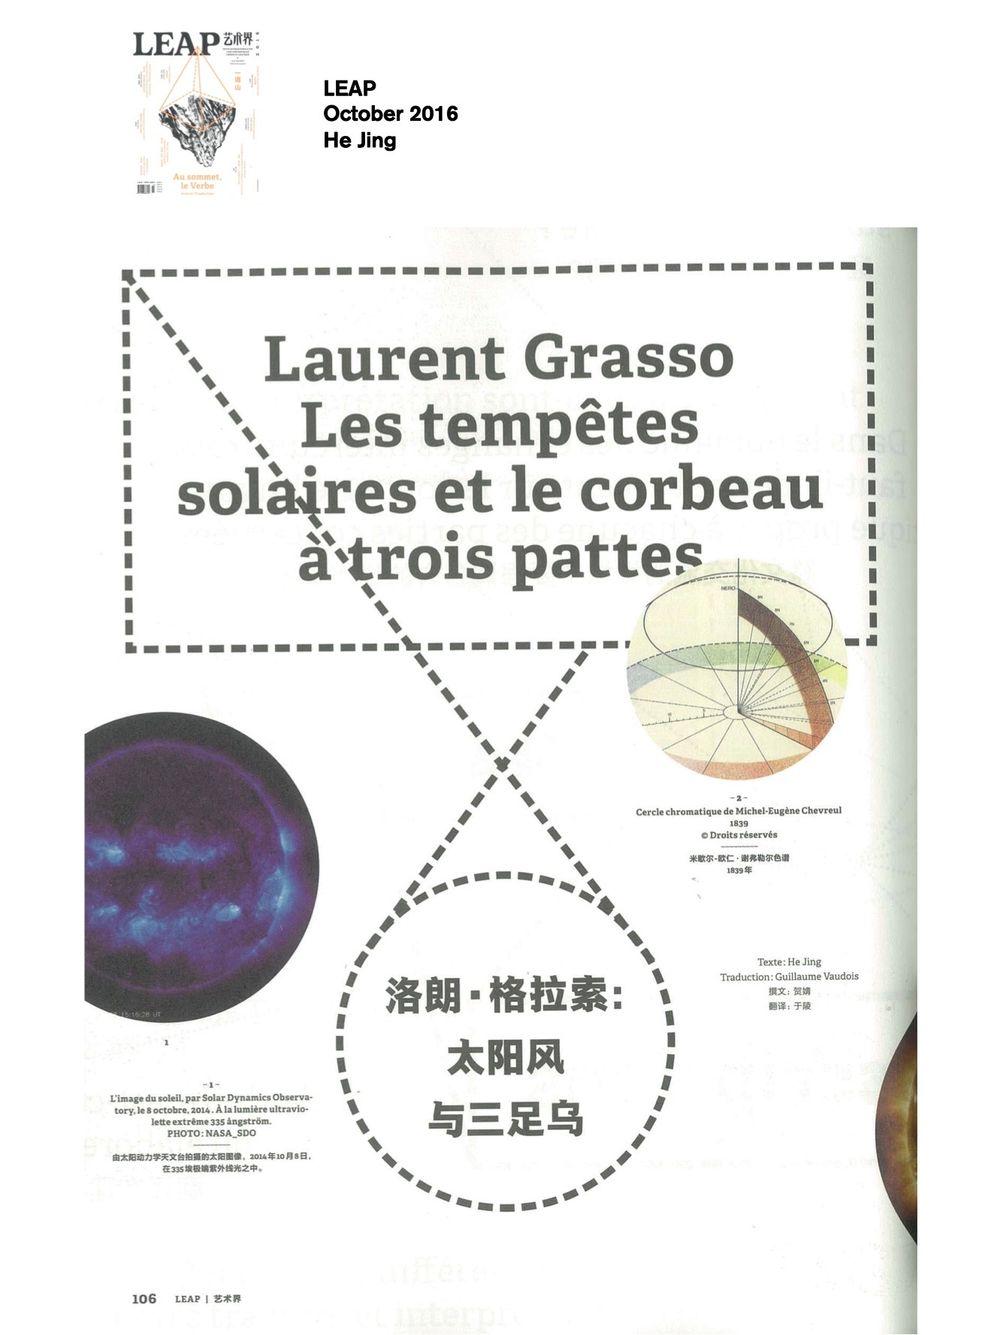 LEAP | Laurent GRASSO